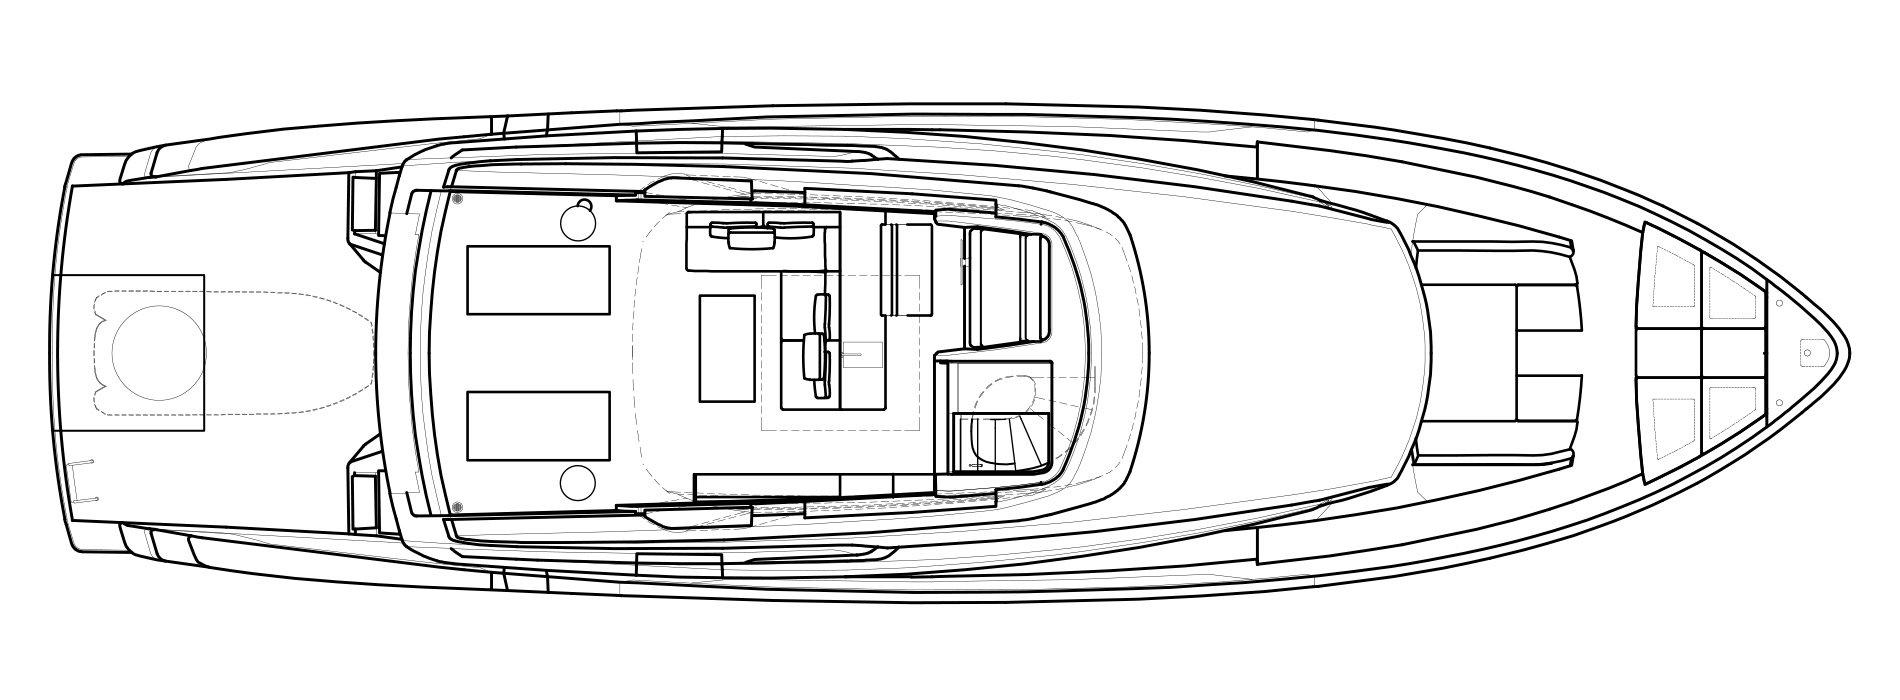 Sanlorenzo Yachts SX76 Флайбридж версия Lissoni